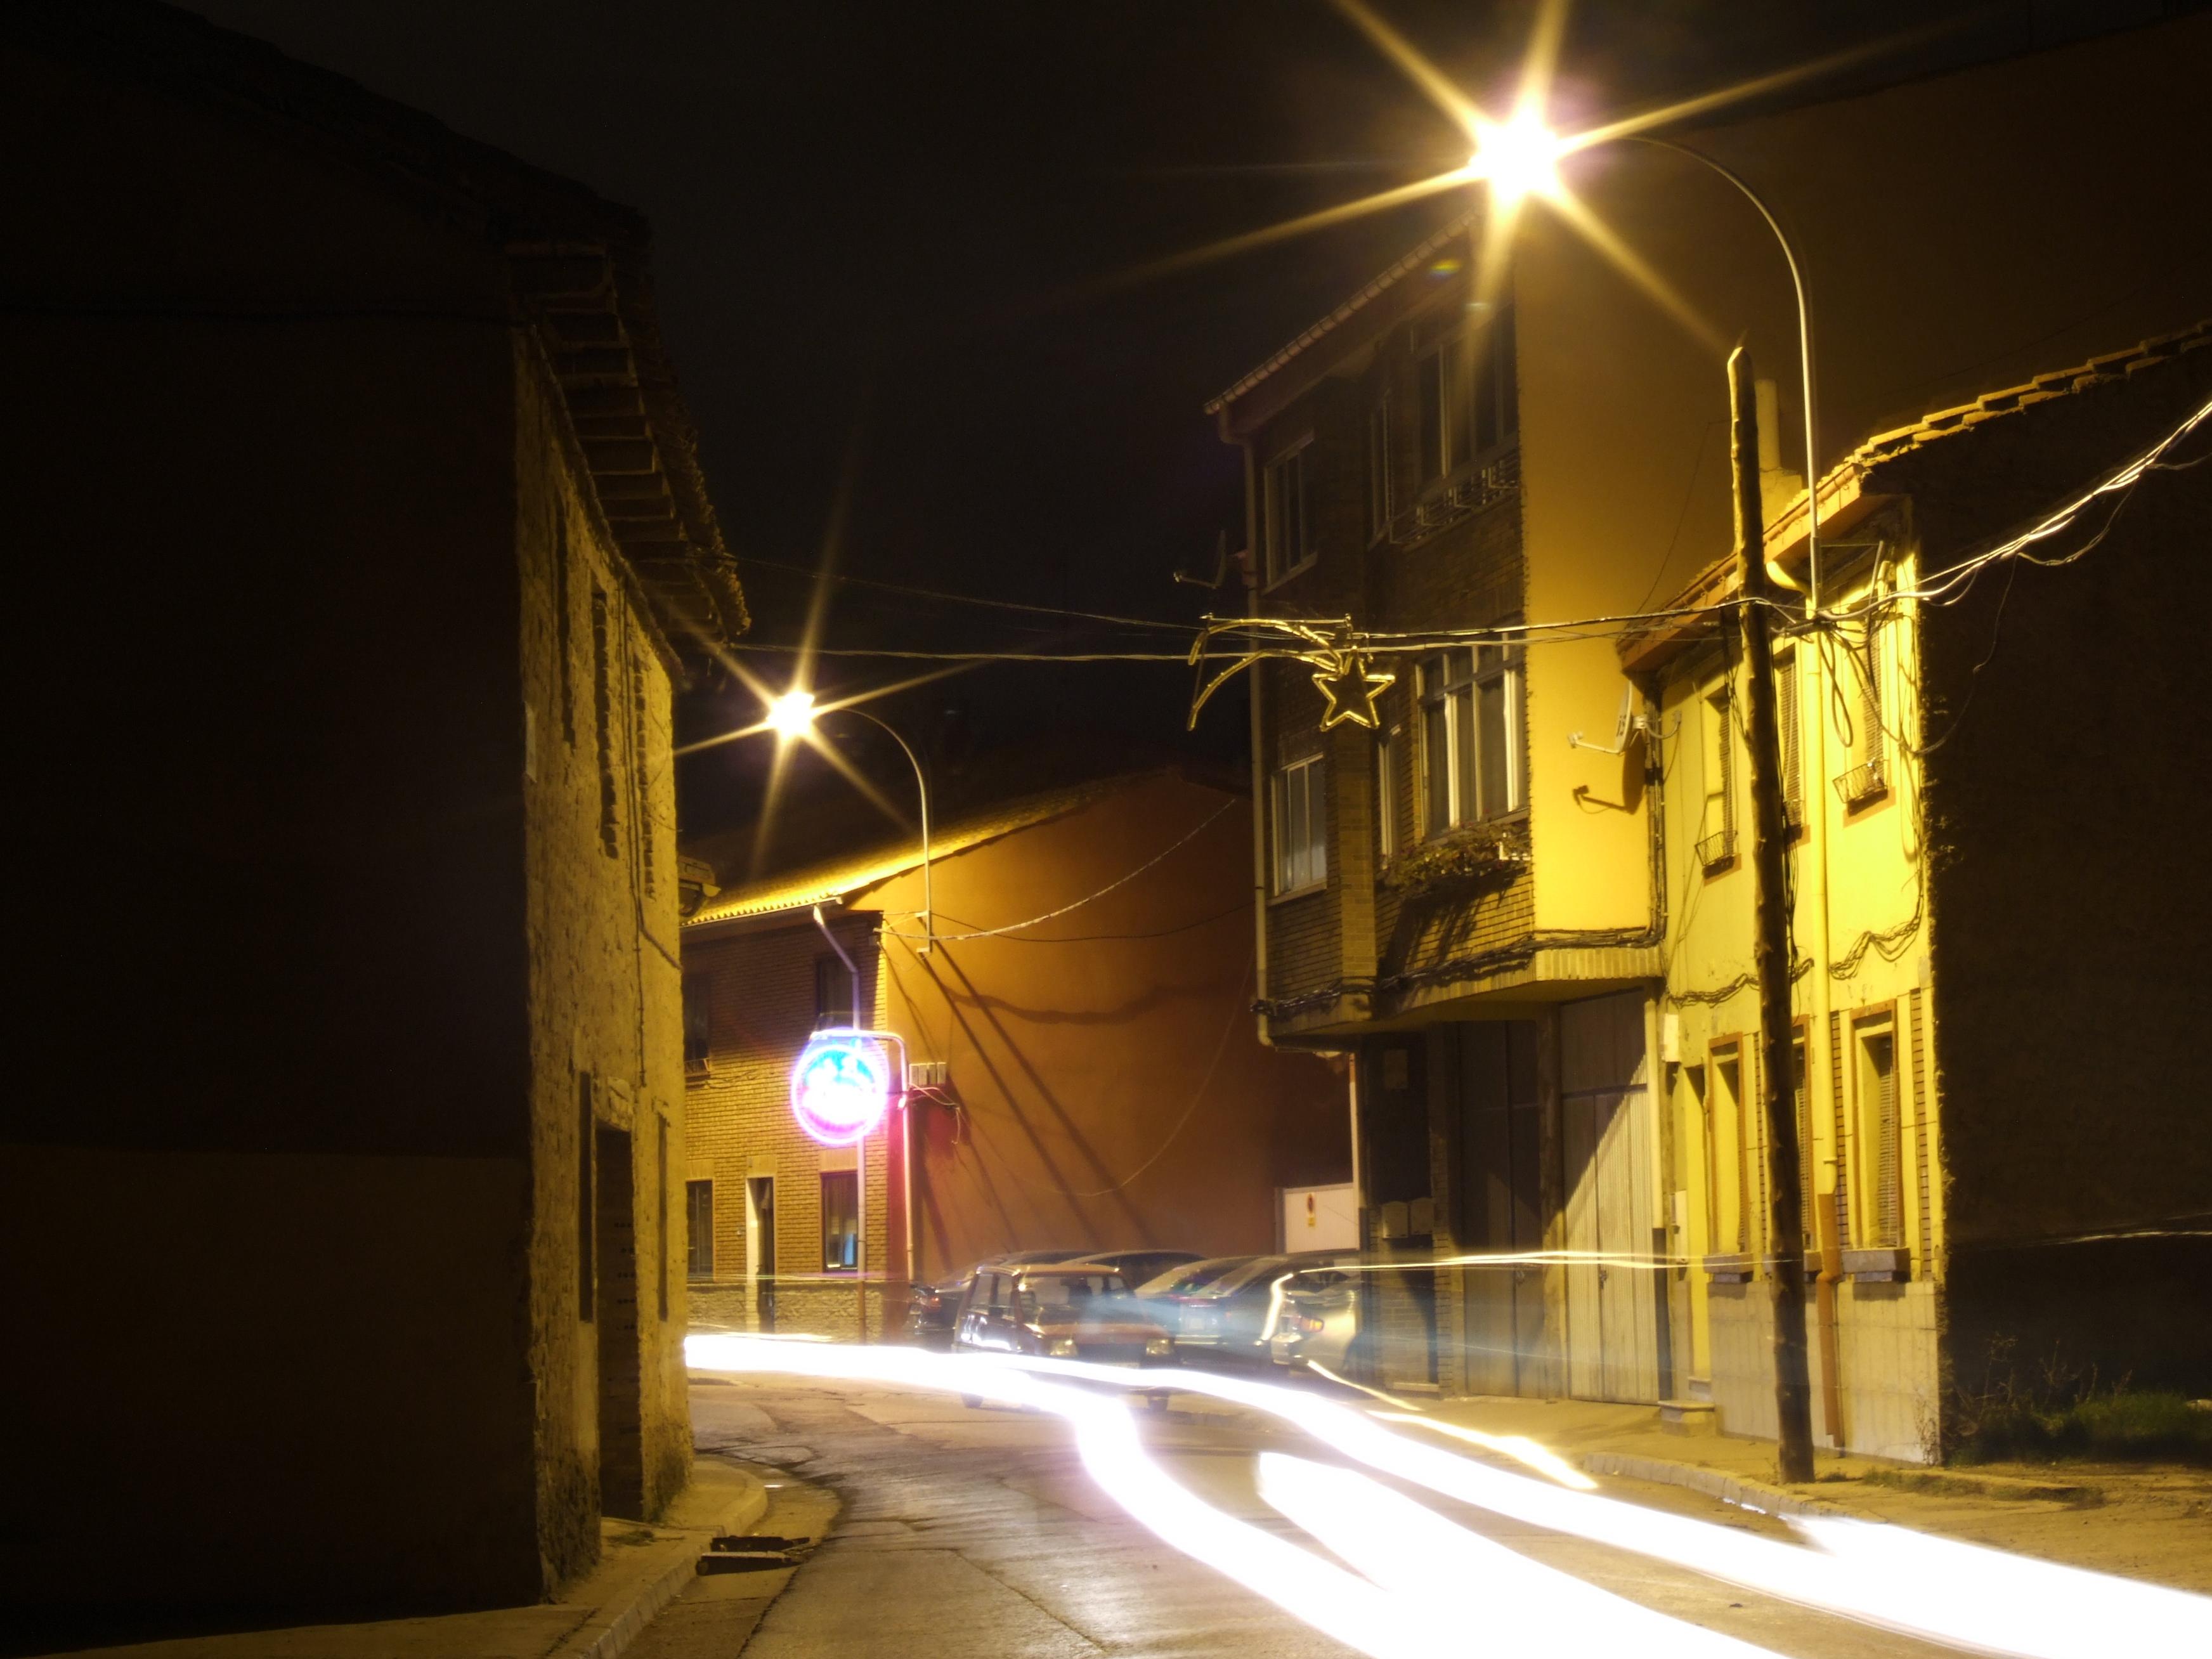 julio street night houses streetlights lights beautiful glow lens flares